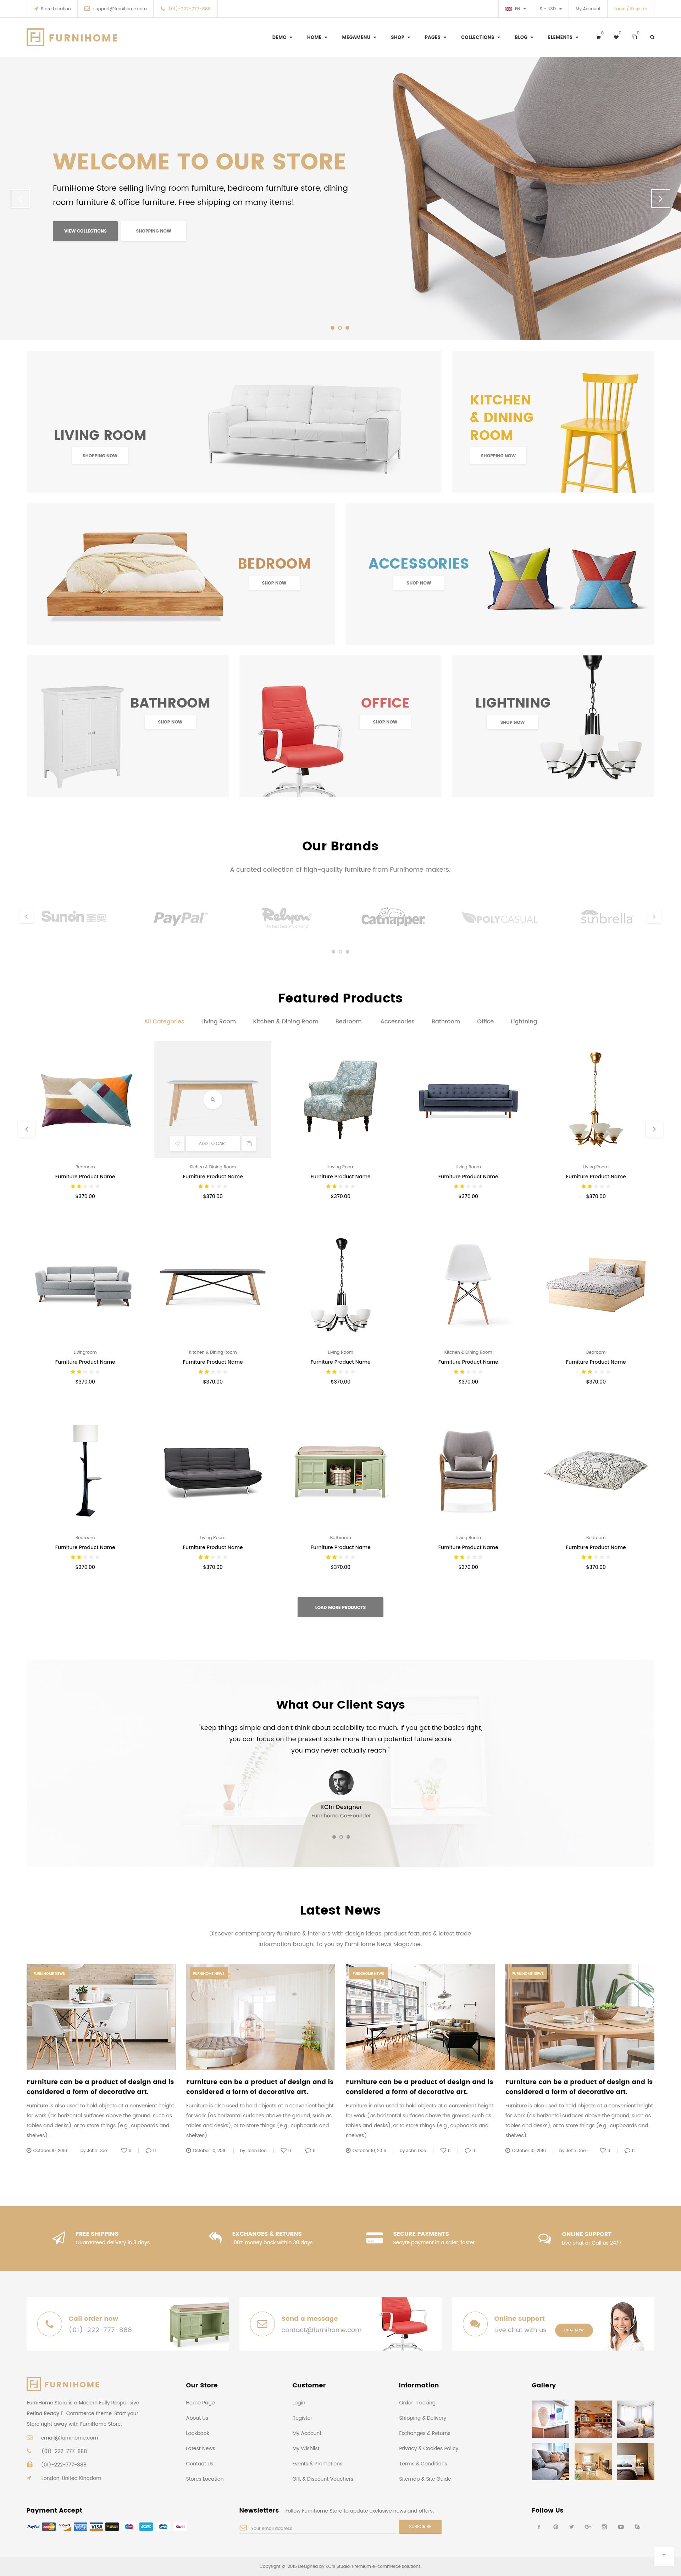 Furnihome E Commerce Psd Template For Furniture Store Pinterest